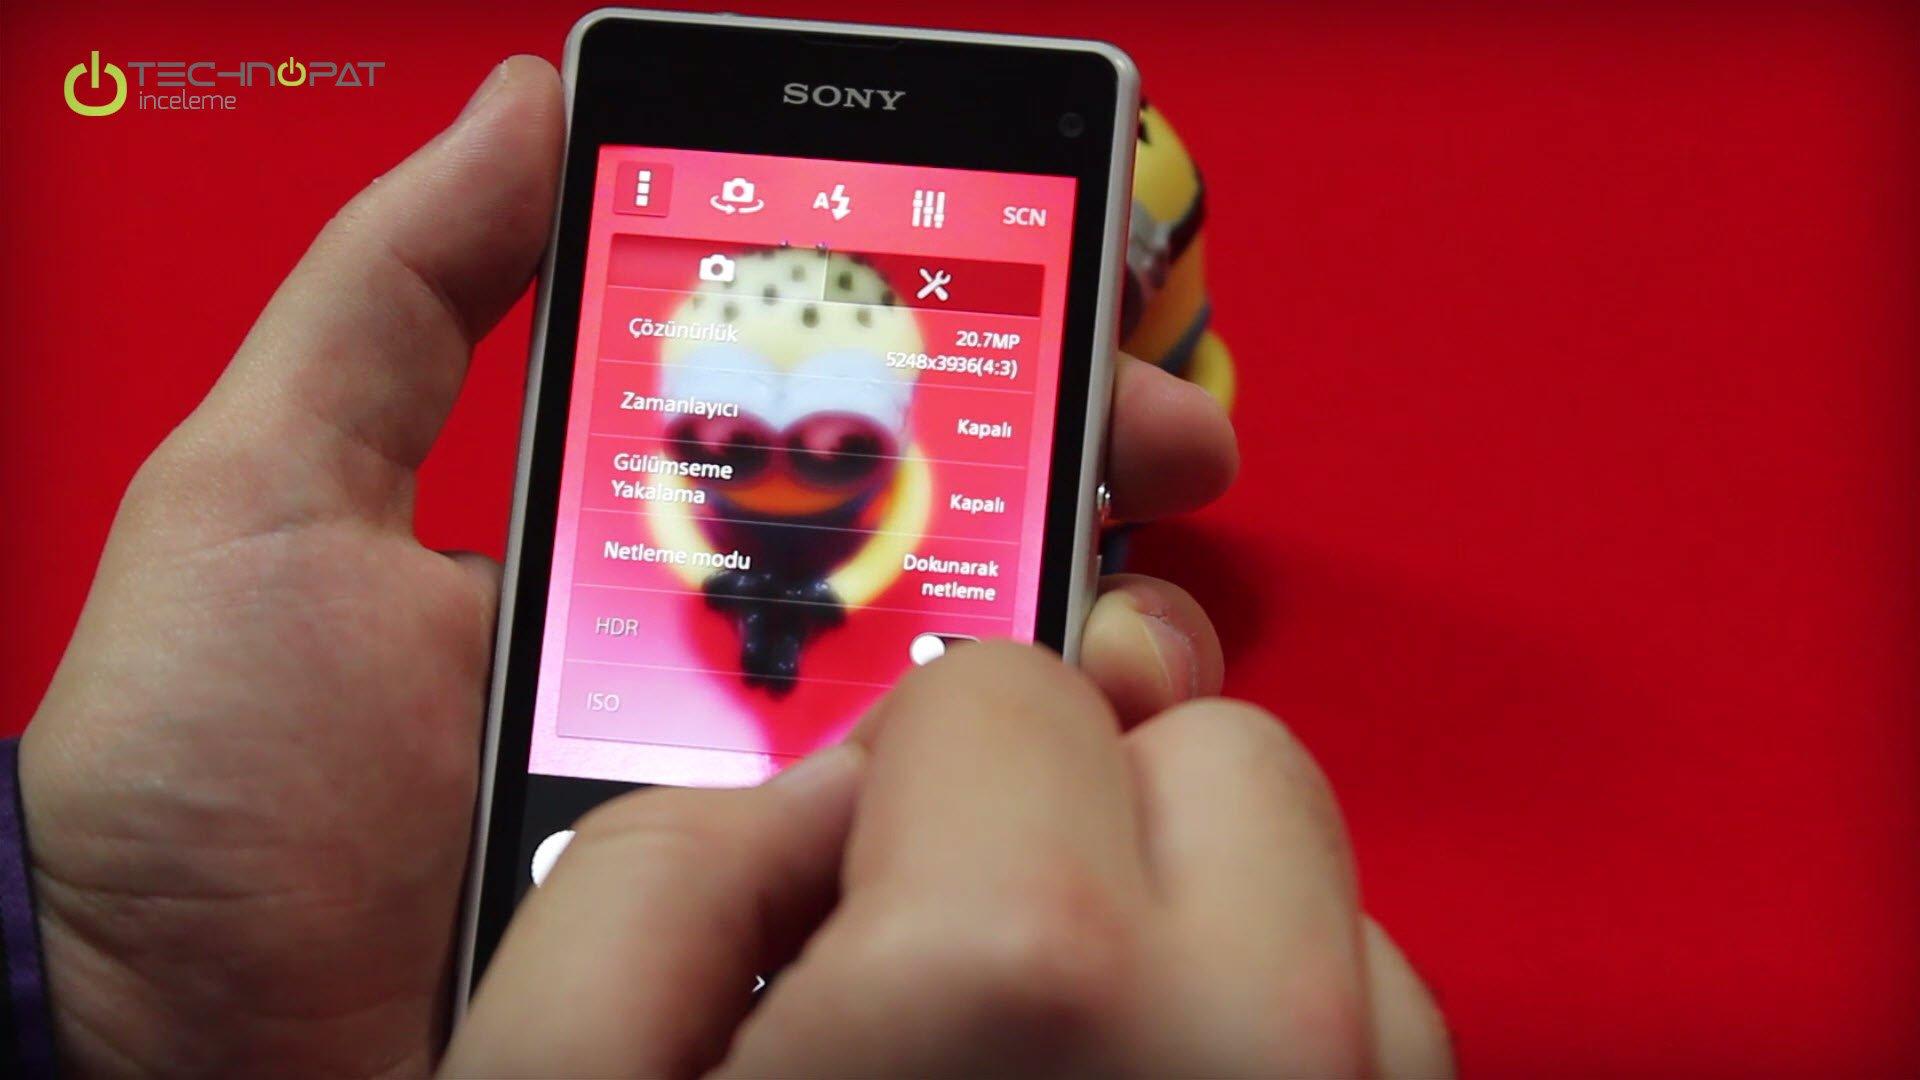 sony-xperia-z1-compact-inceleme-technopat-11-kamera